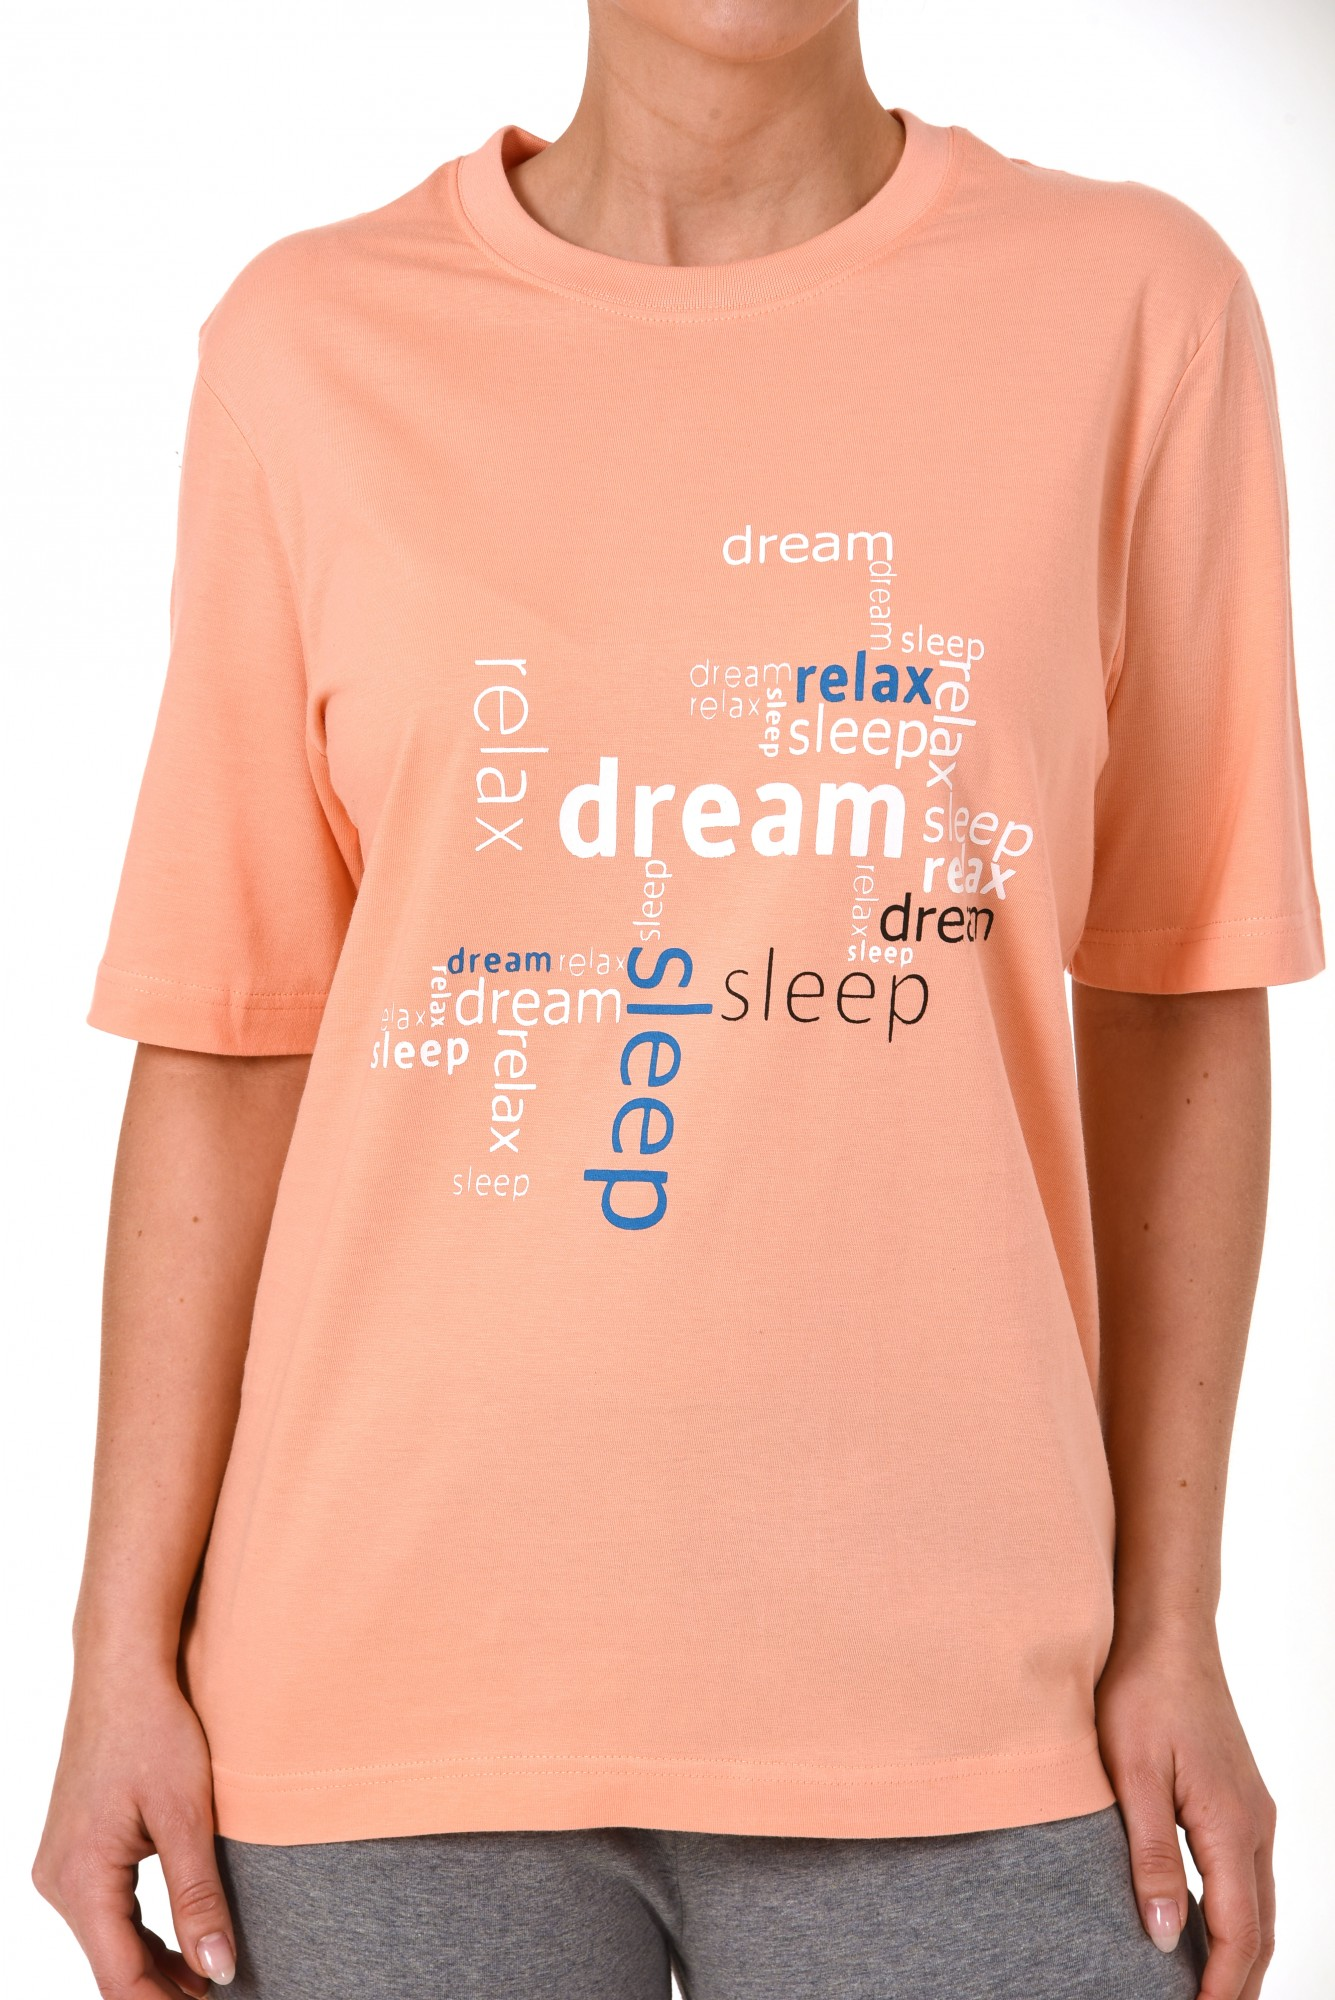 Damen Capri Pyjama 7/8-lange Hose und kurzarm Oberteil – 171 204 90 828 – Bild 4